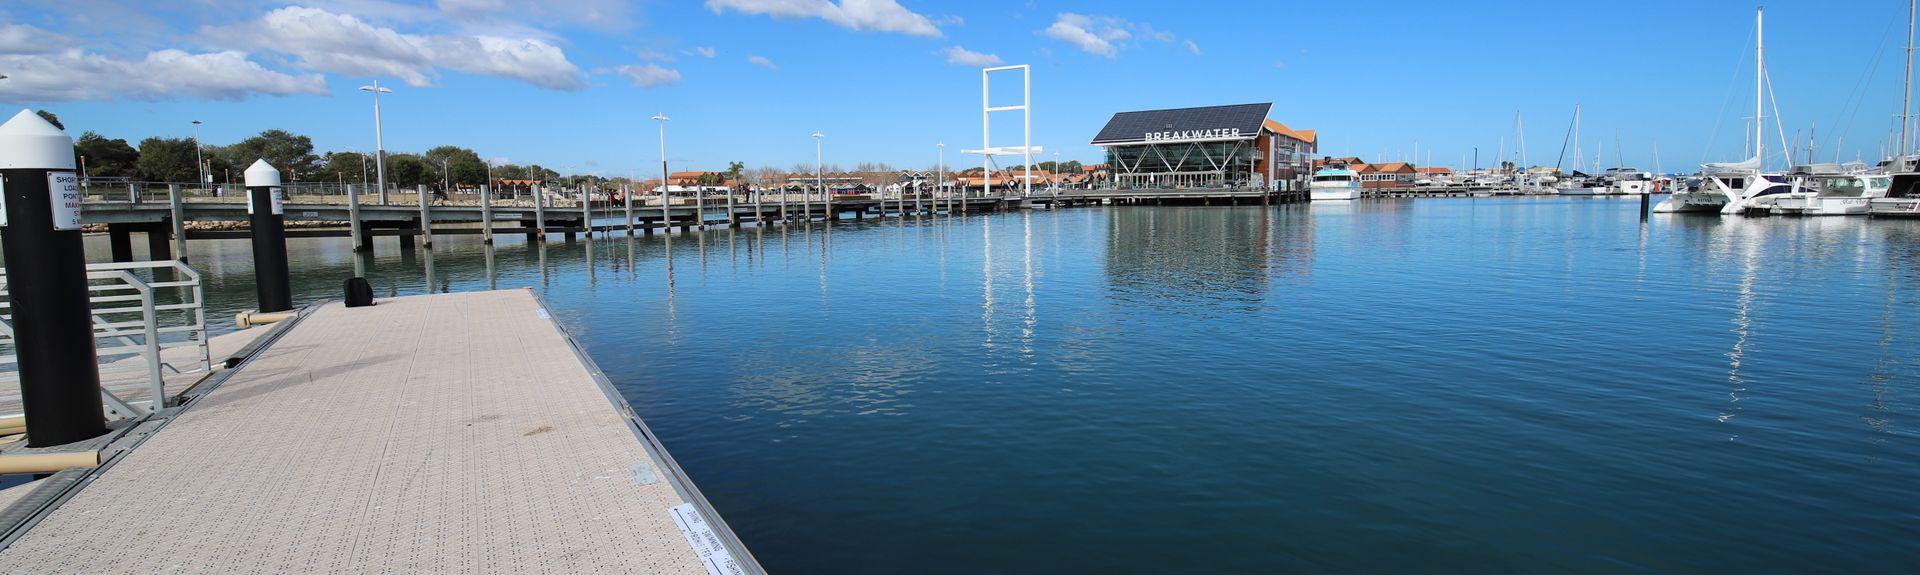 The Basin, Perth, Western Australia, Australia